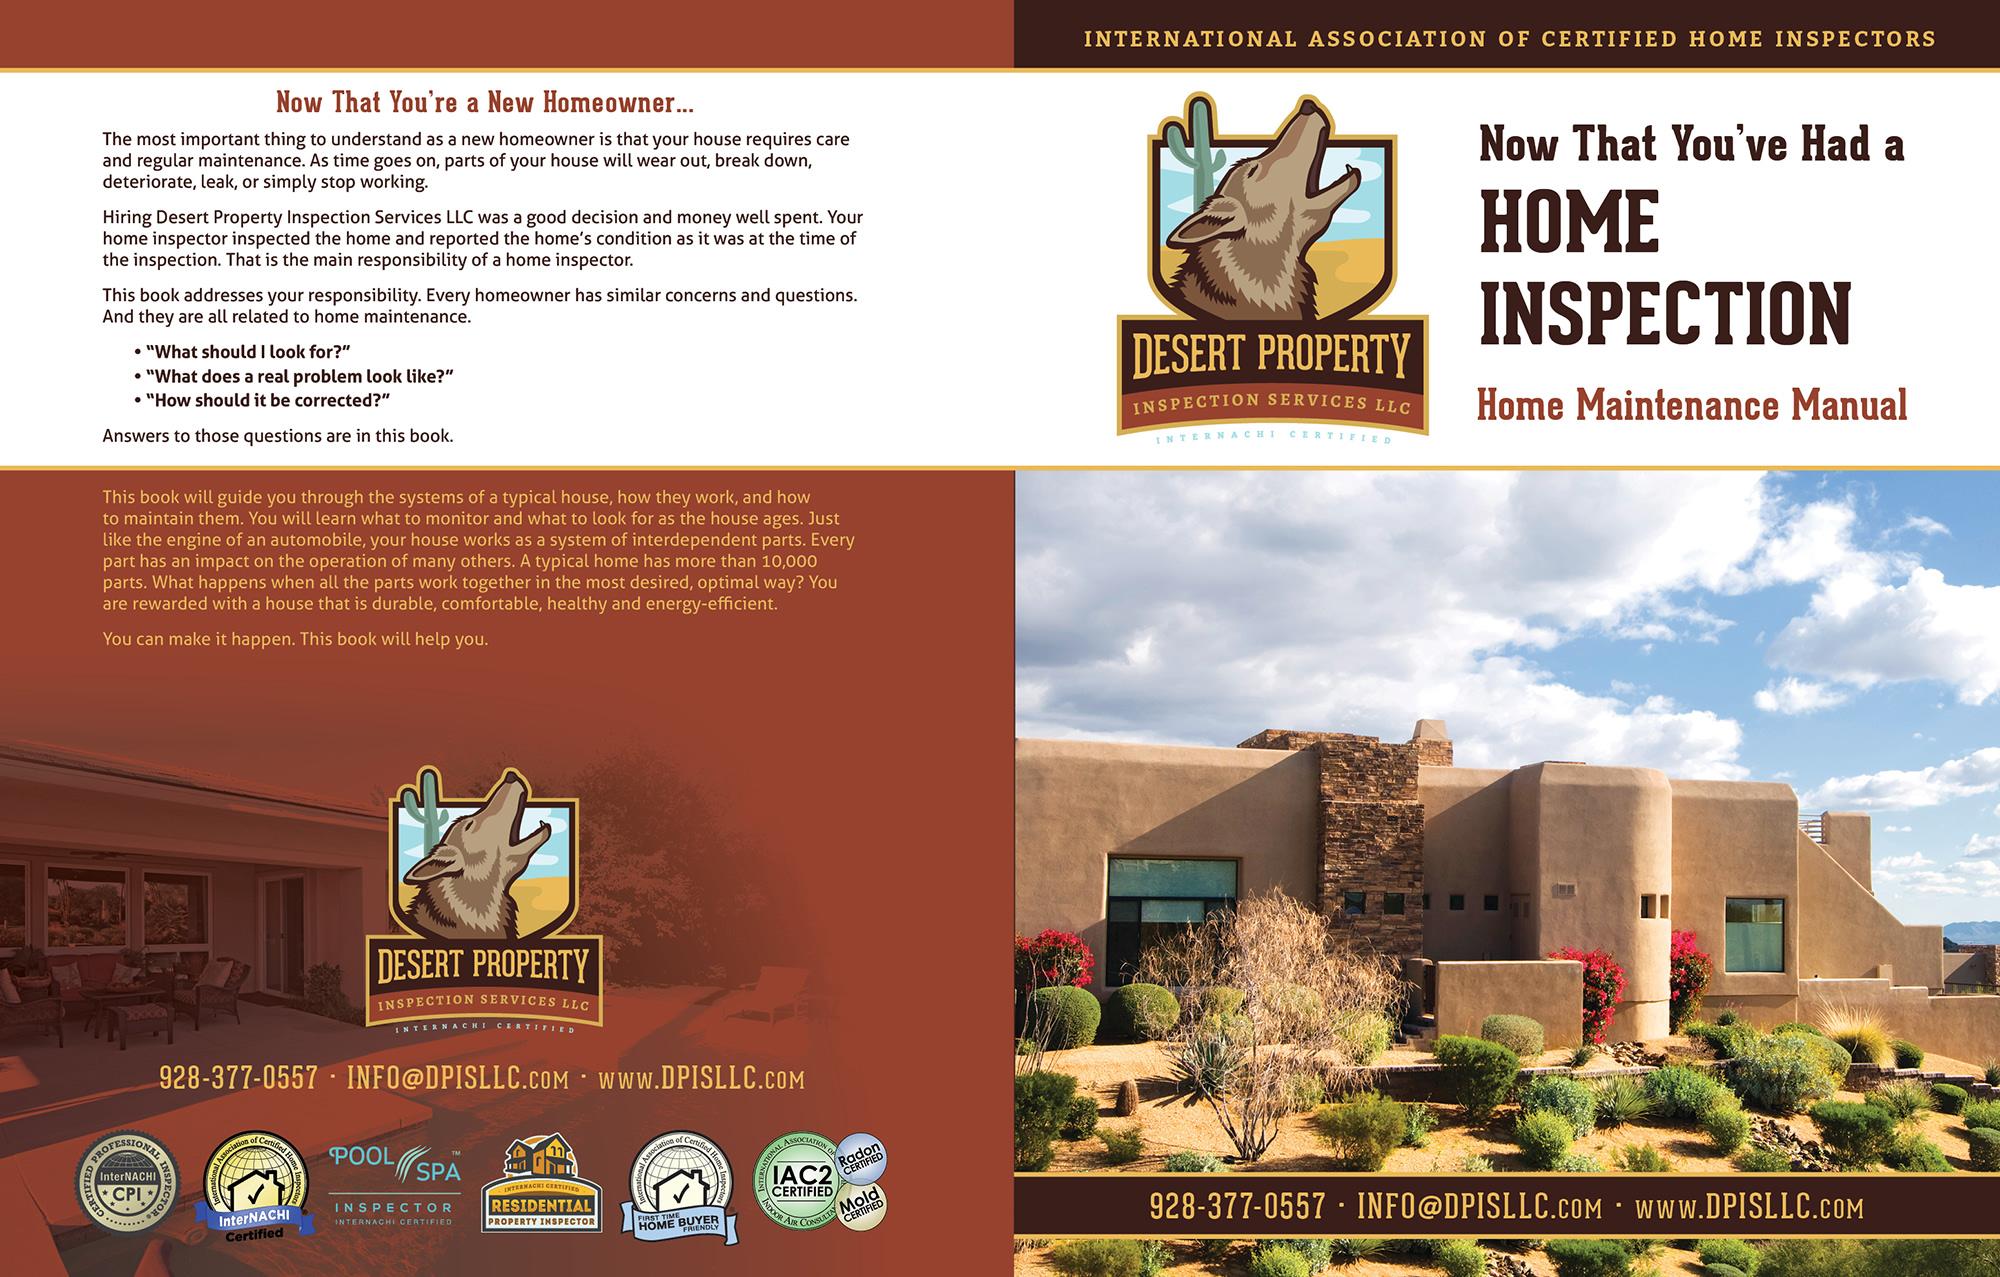 Custom Home Maintenance Book for Desert-Property-Inspection-Services